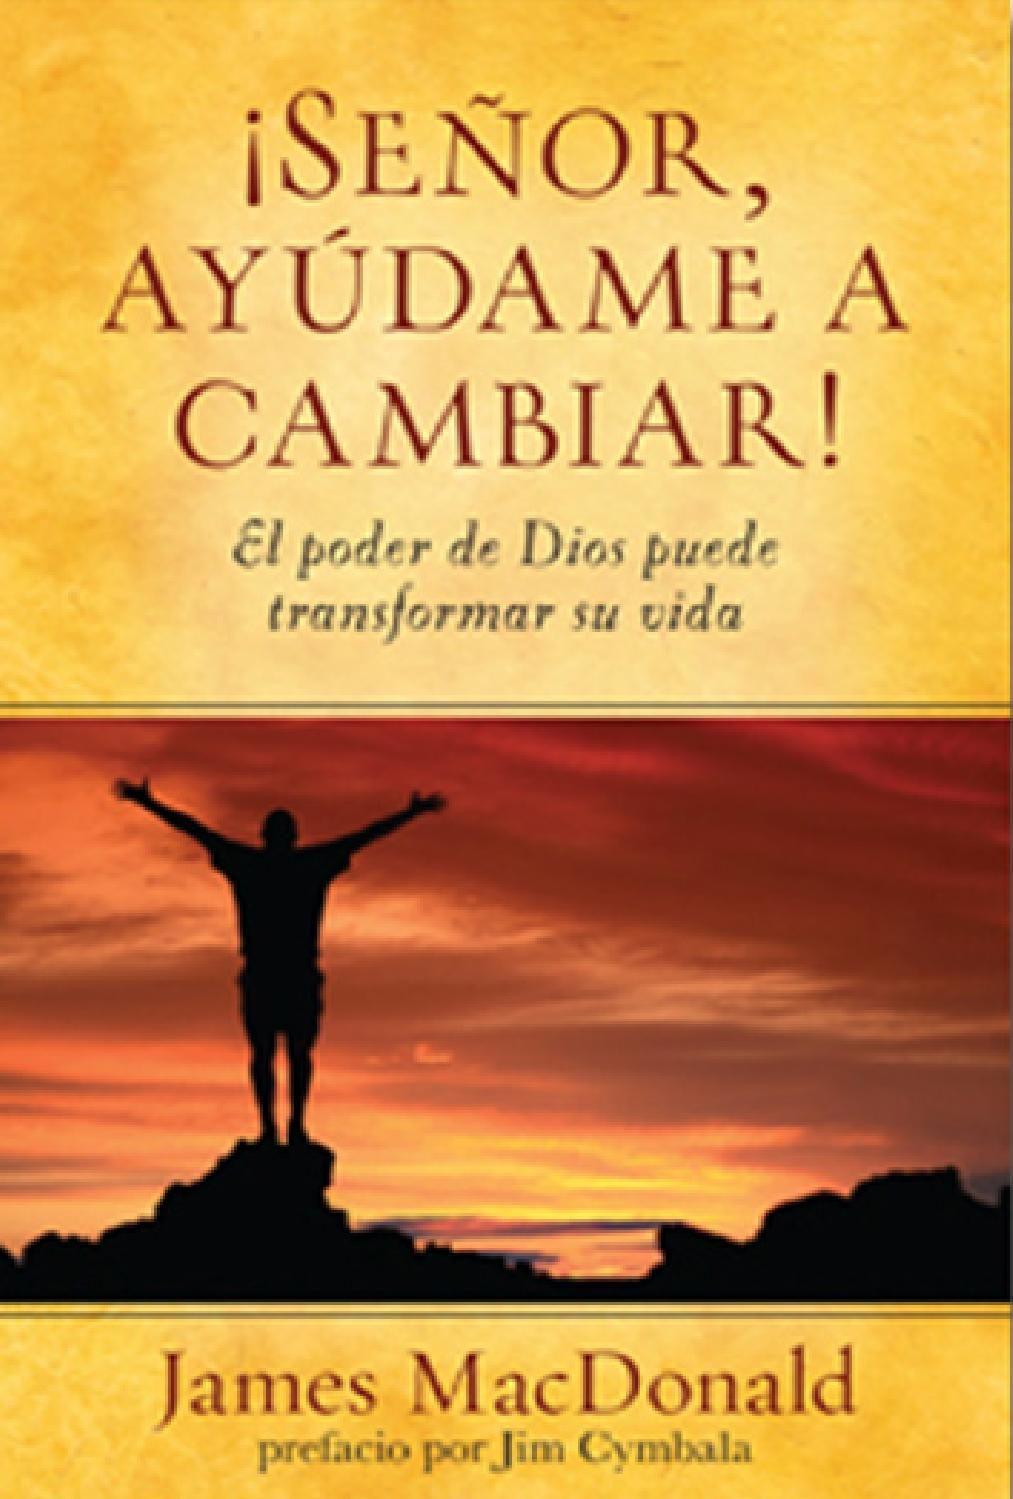 Senor Ayudame A Cambiar Libros De Espiritualidad Descargar Libros Cristianos Libros Cristianos Pdf